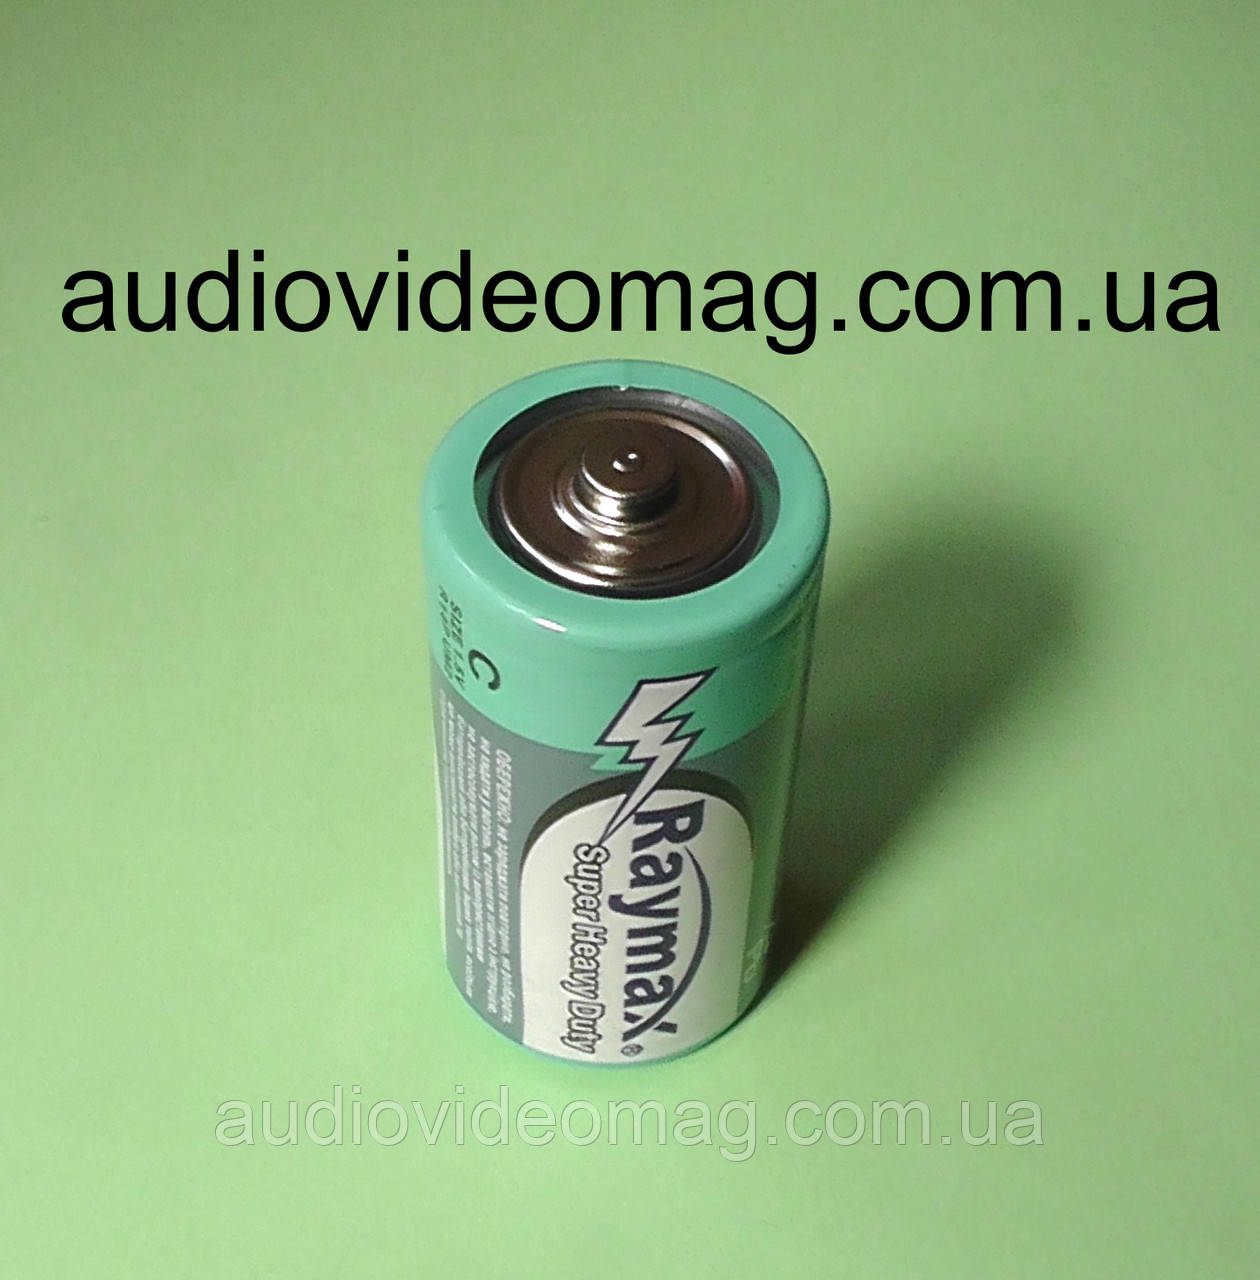 Батарейки R14 (тип С) 1.5V Raymax, солевая